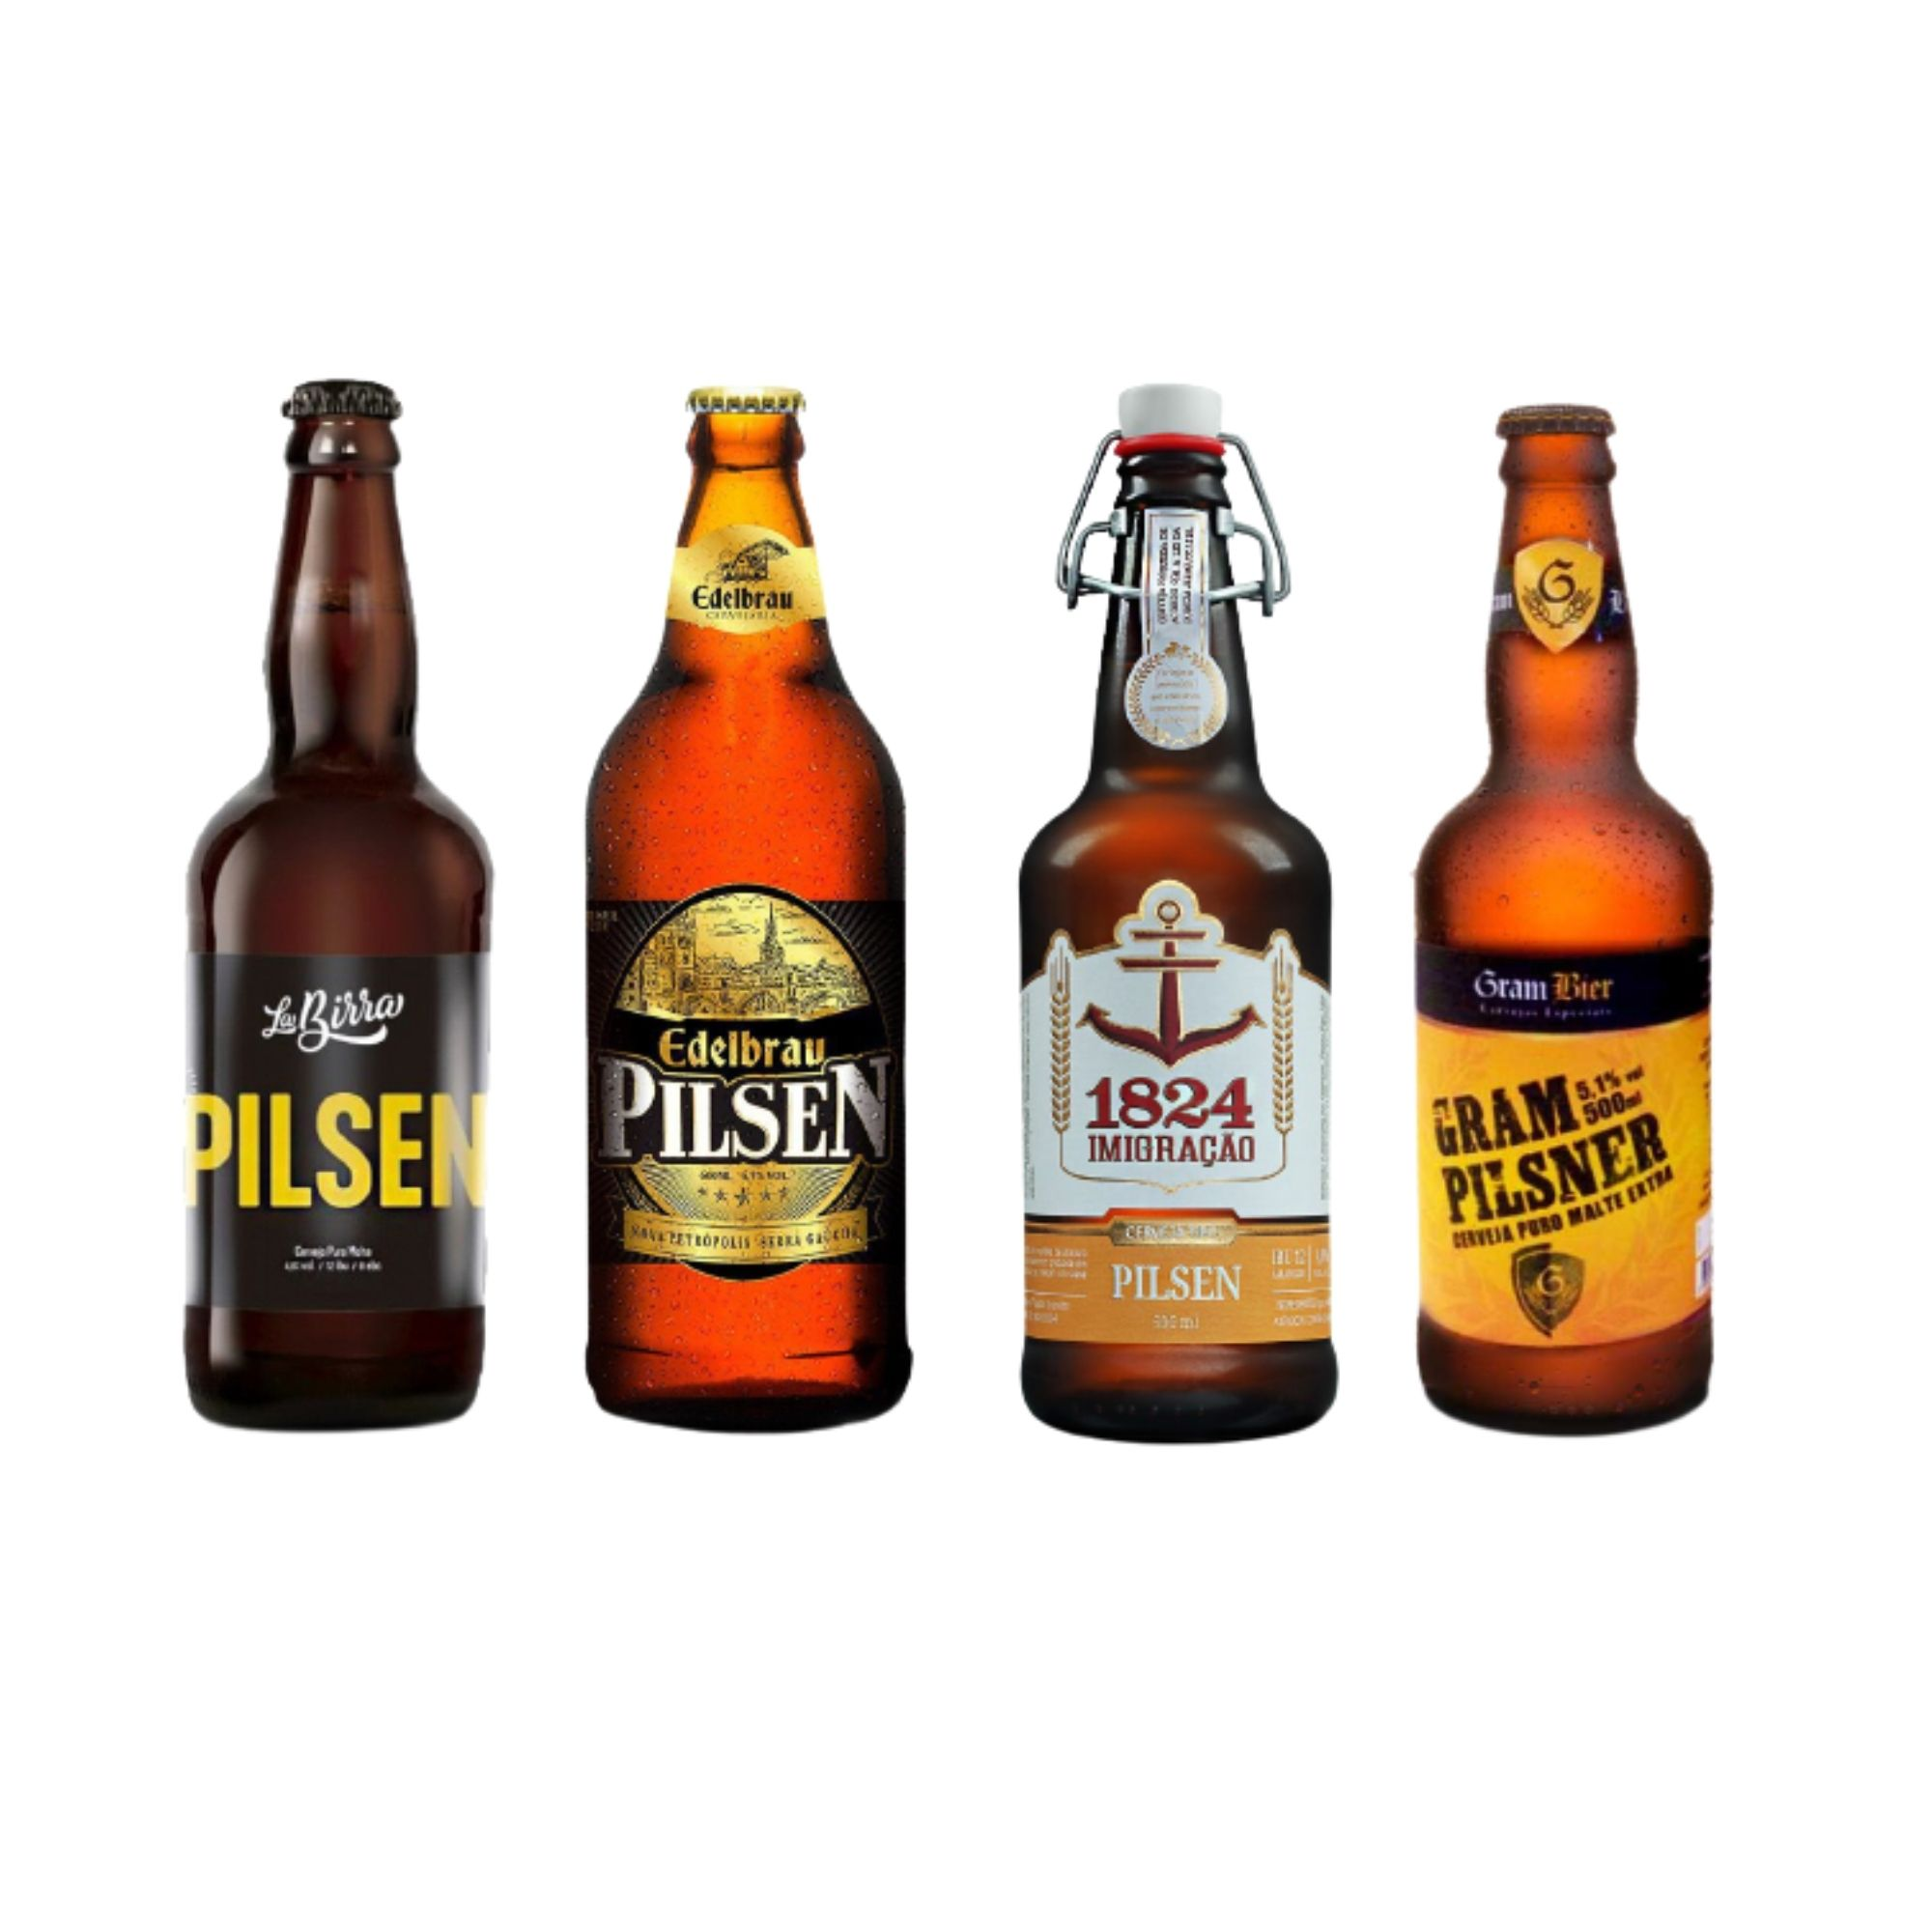 Kit degustação Pilsen 4 cervejas  - RS BEER - Cervejas Gaúchas